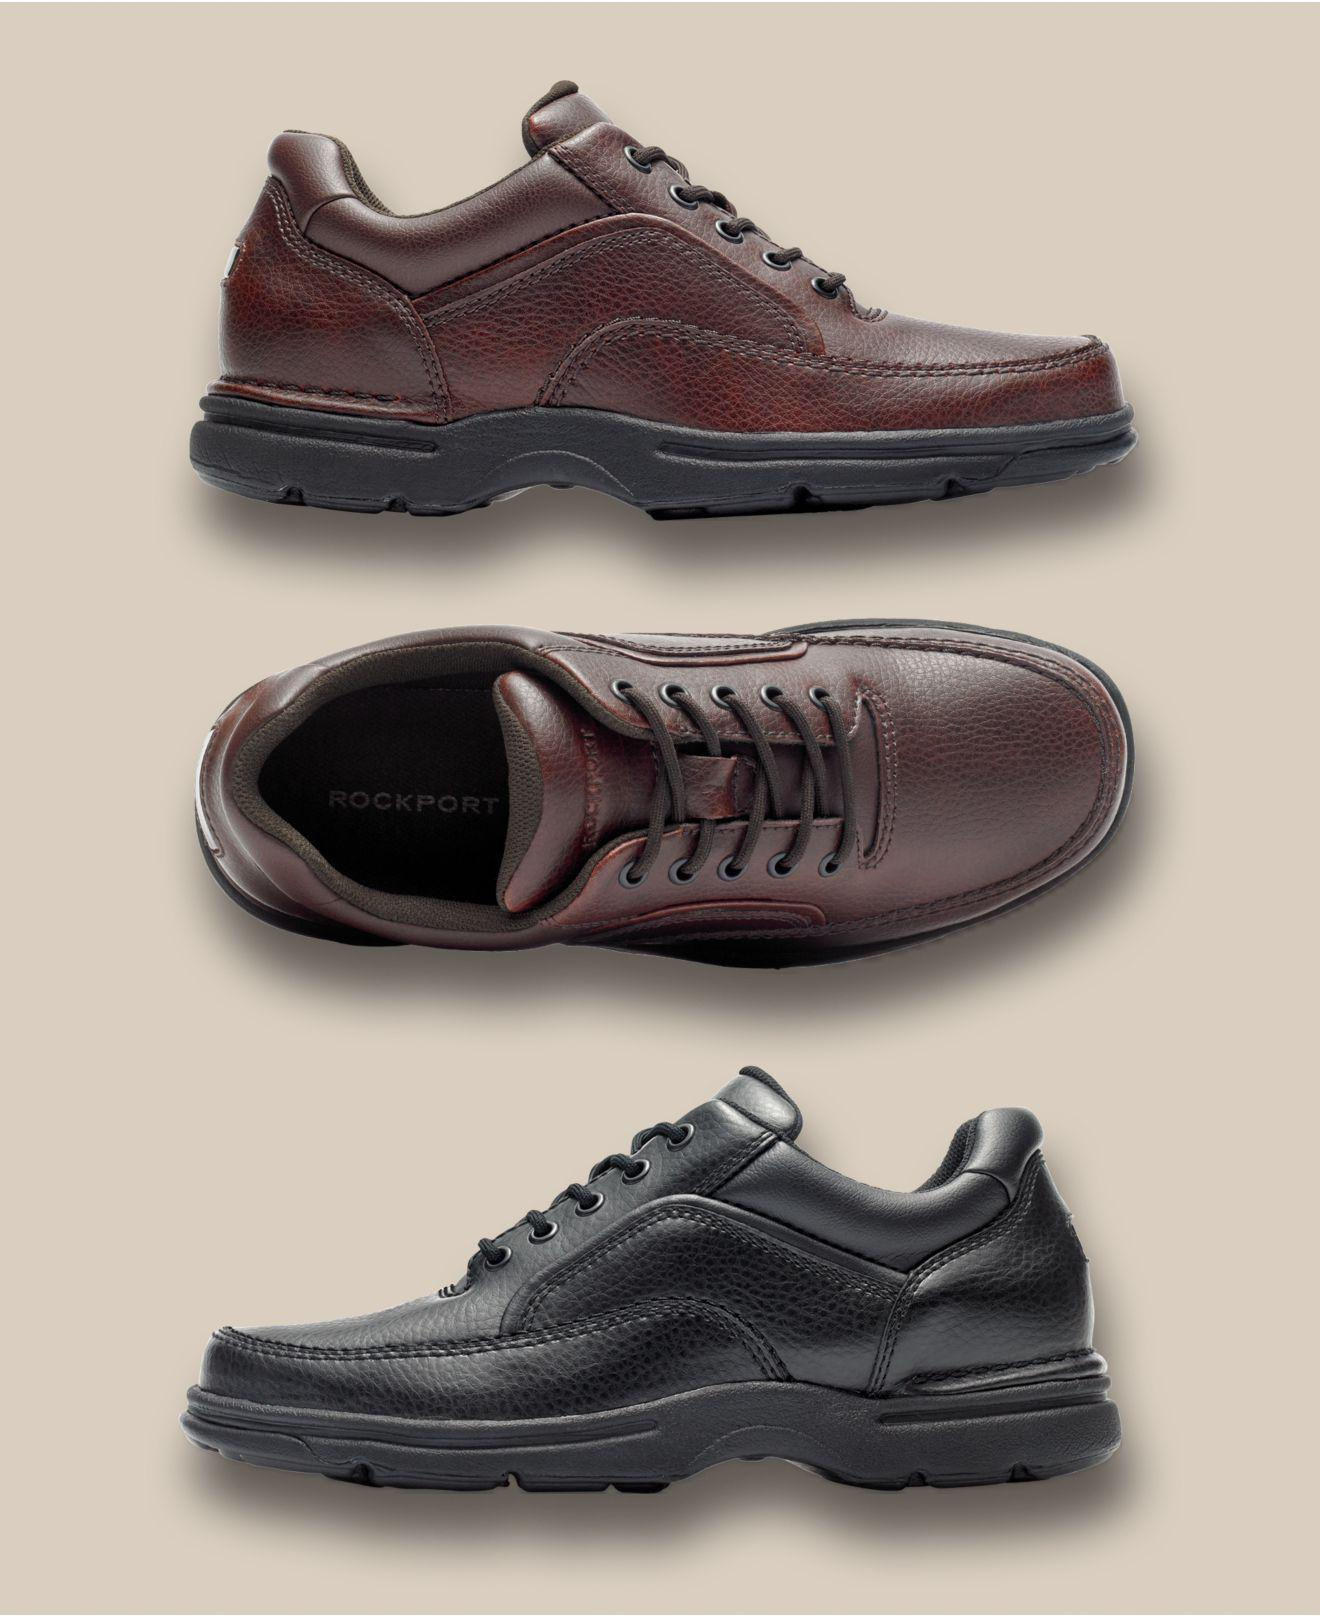 Mens Rockport Shoes At Macy